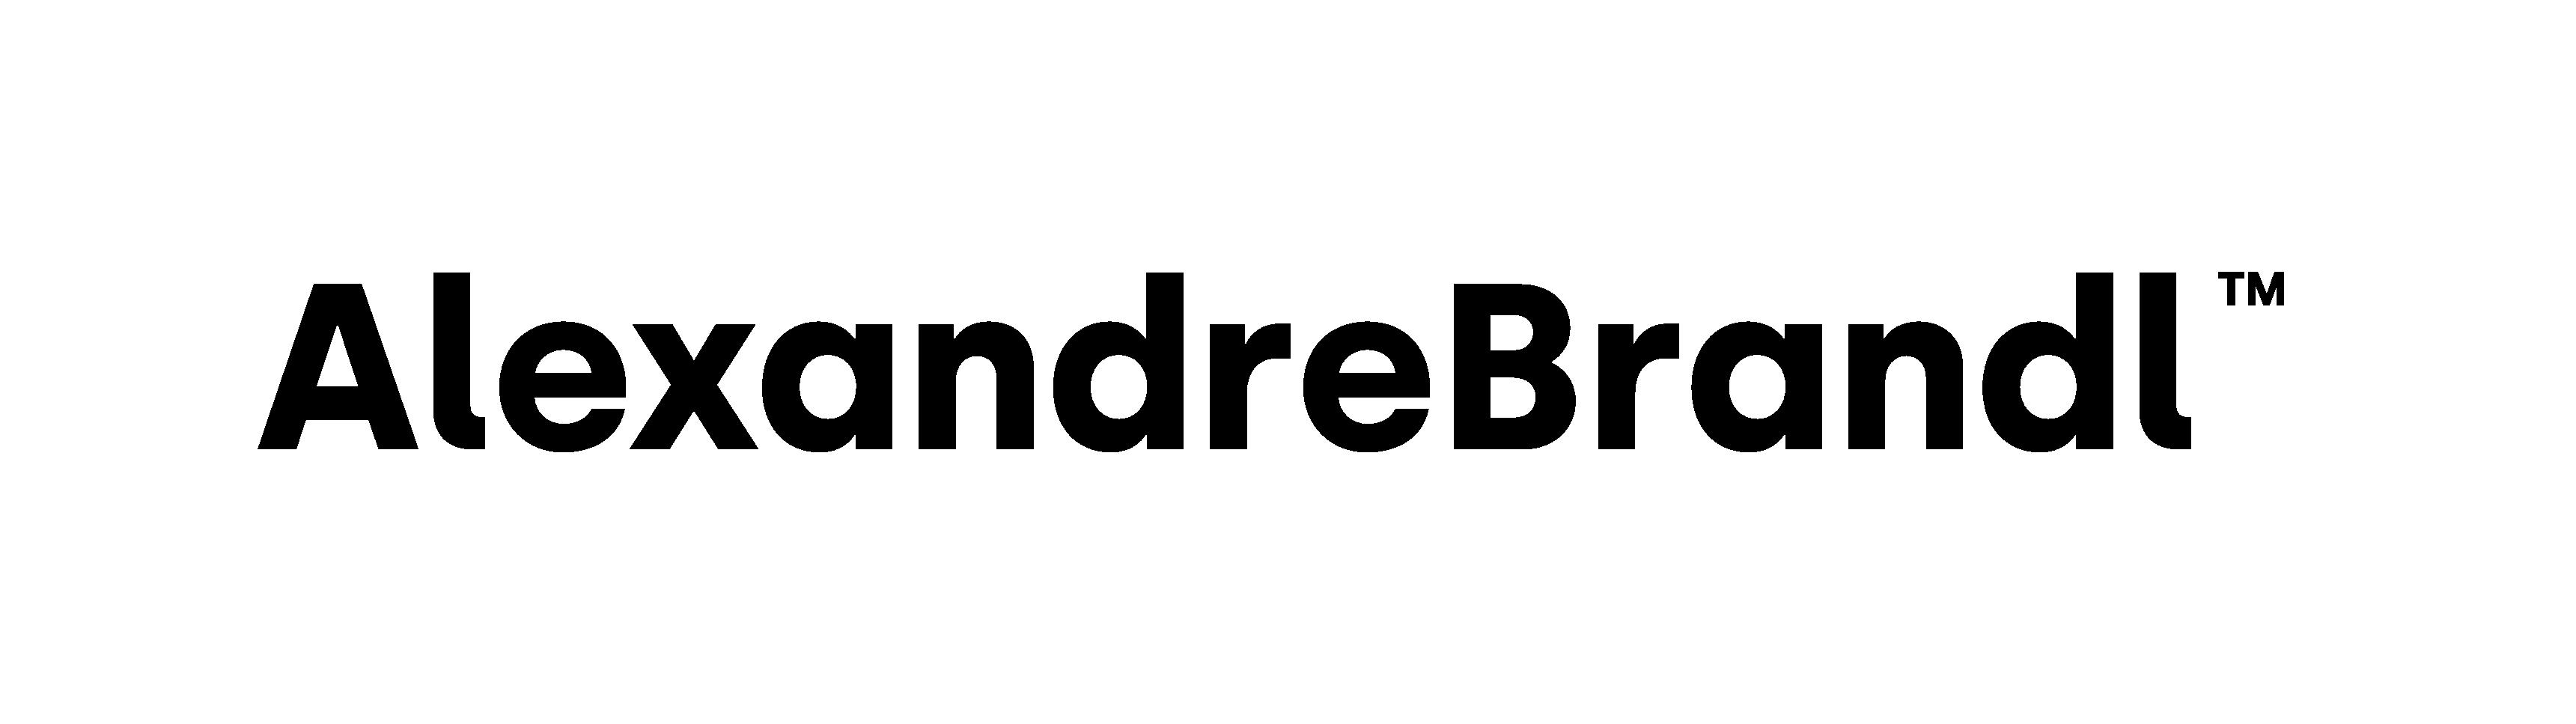 Alexandre Brandl